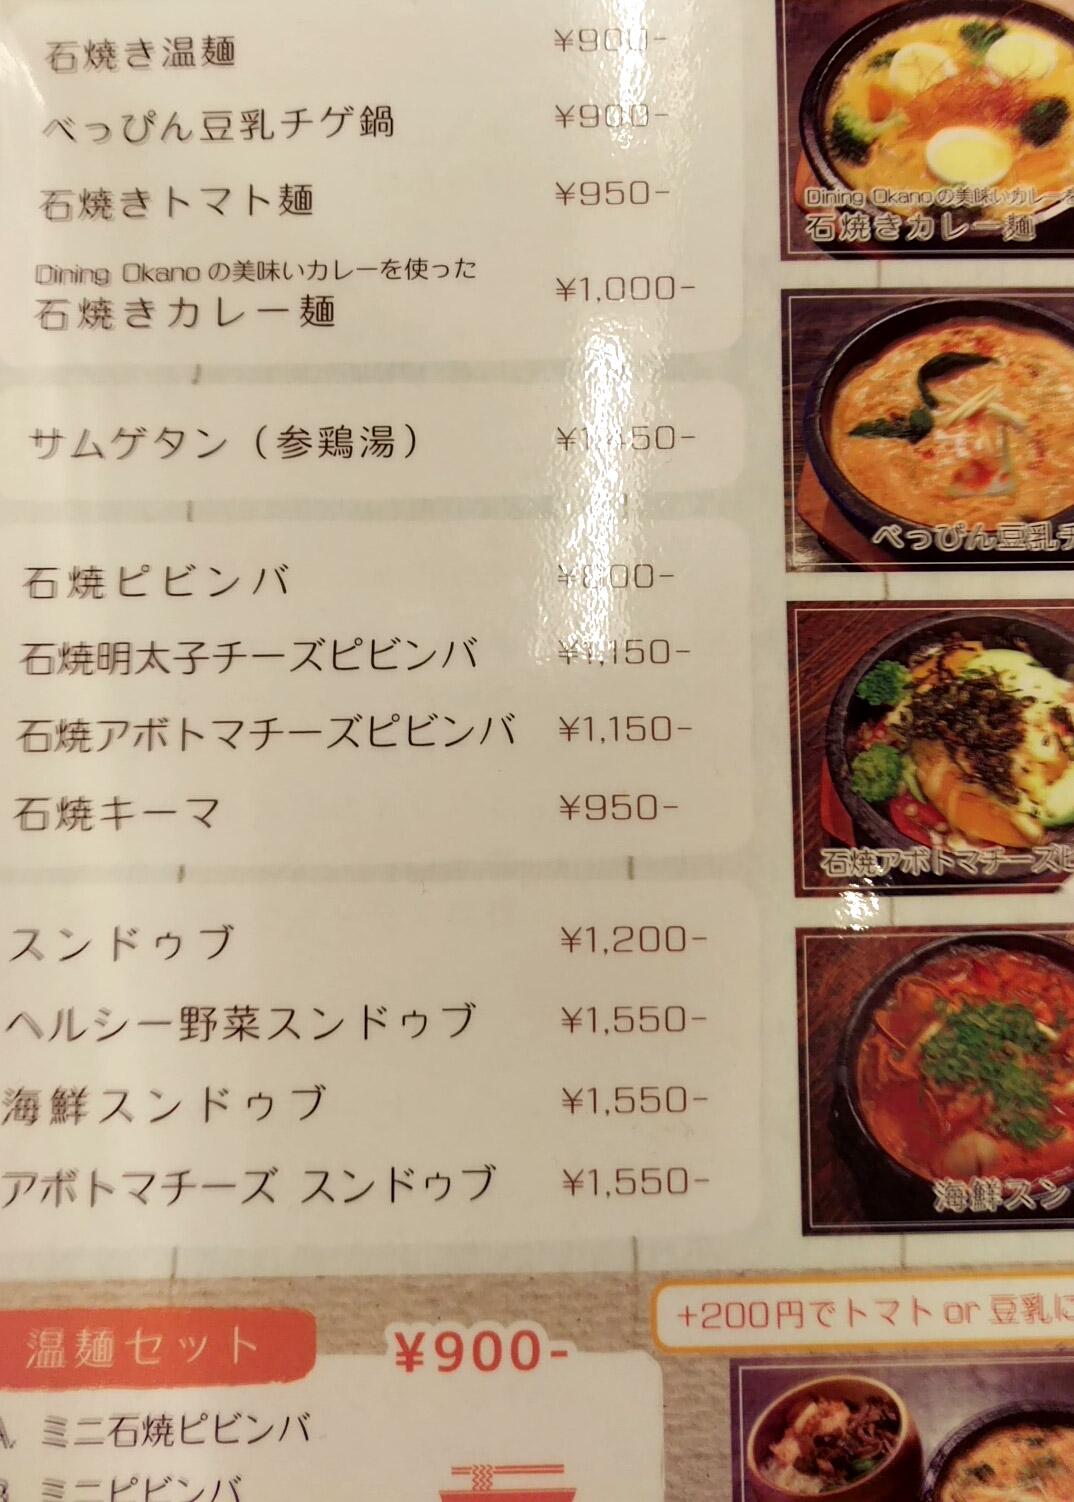 Dining Okanoさんとのコラボ商品!?!?